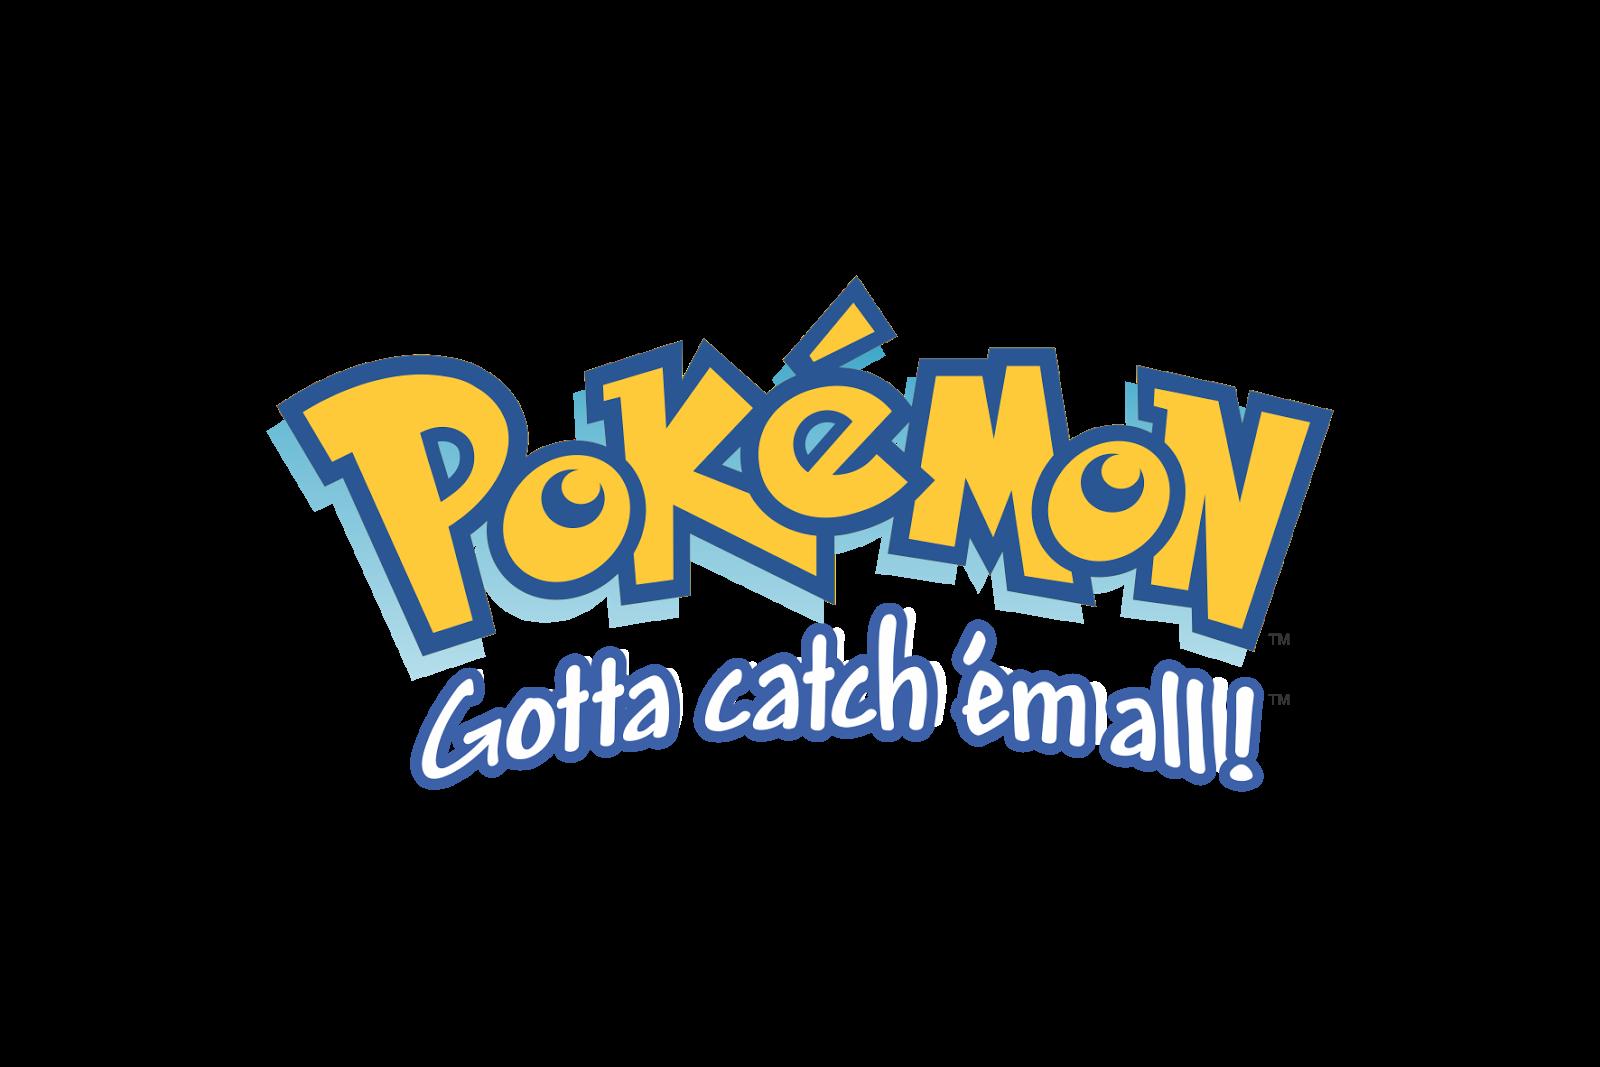 Pin on Pokémon Logos